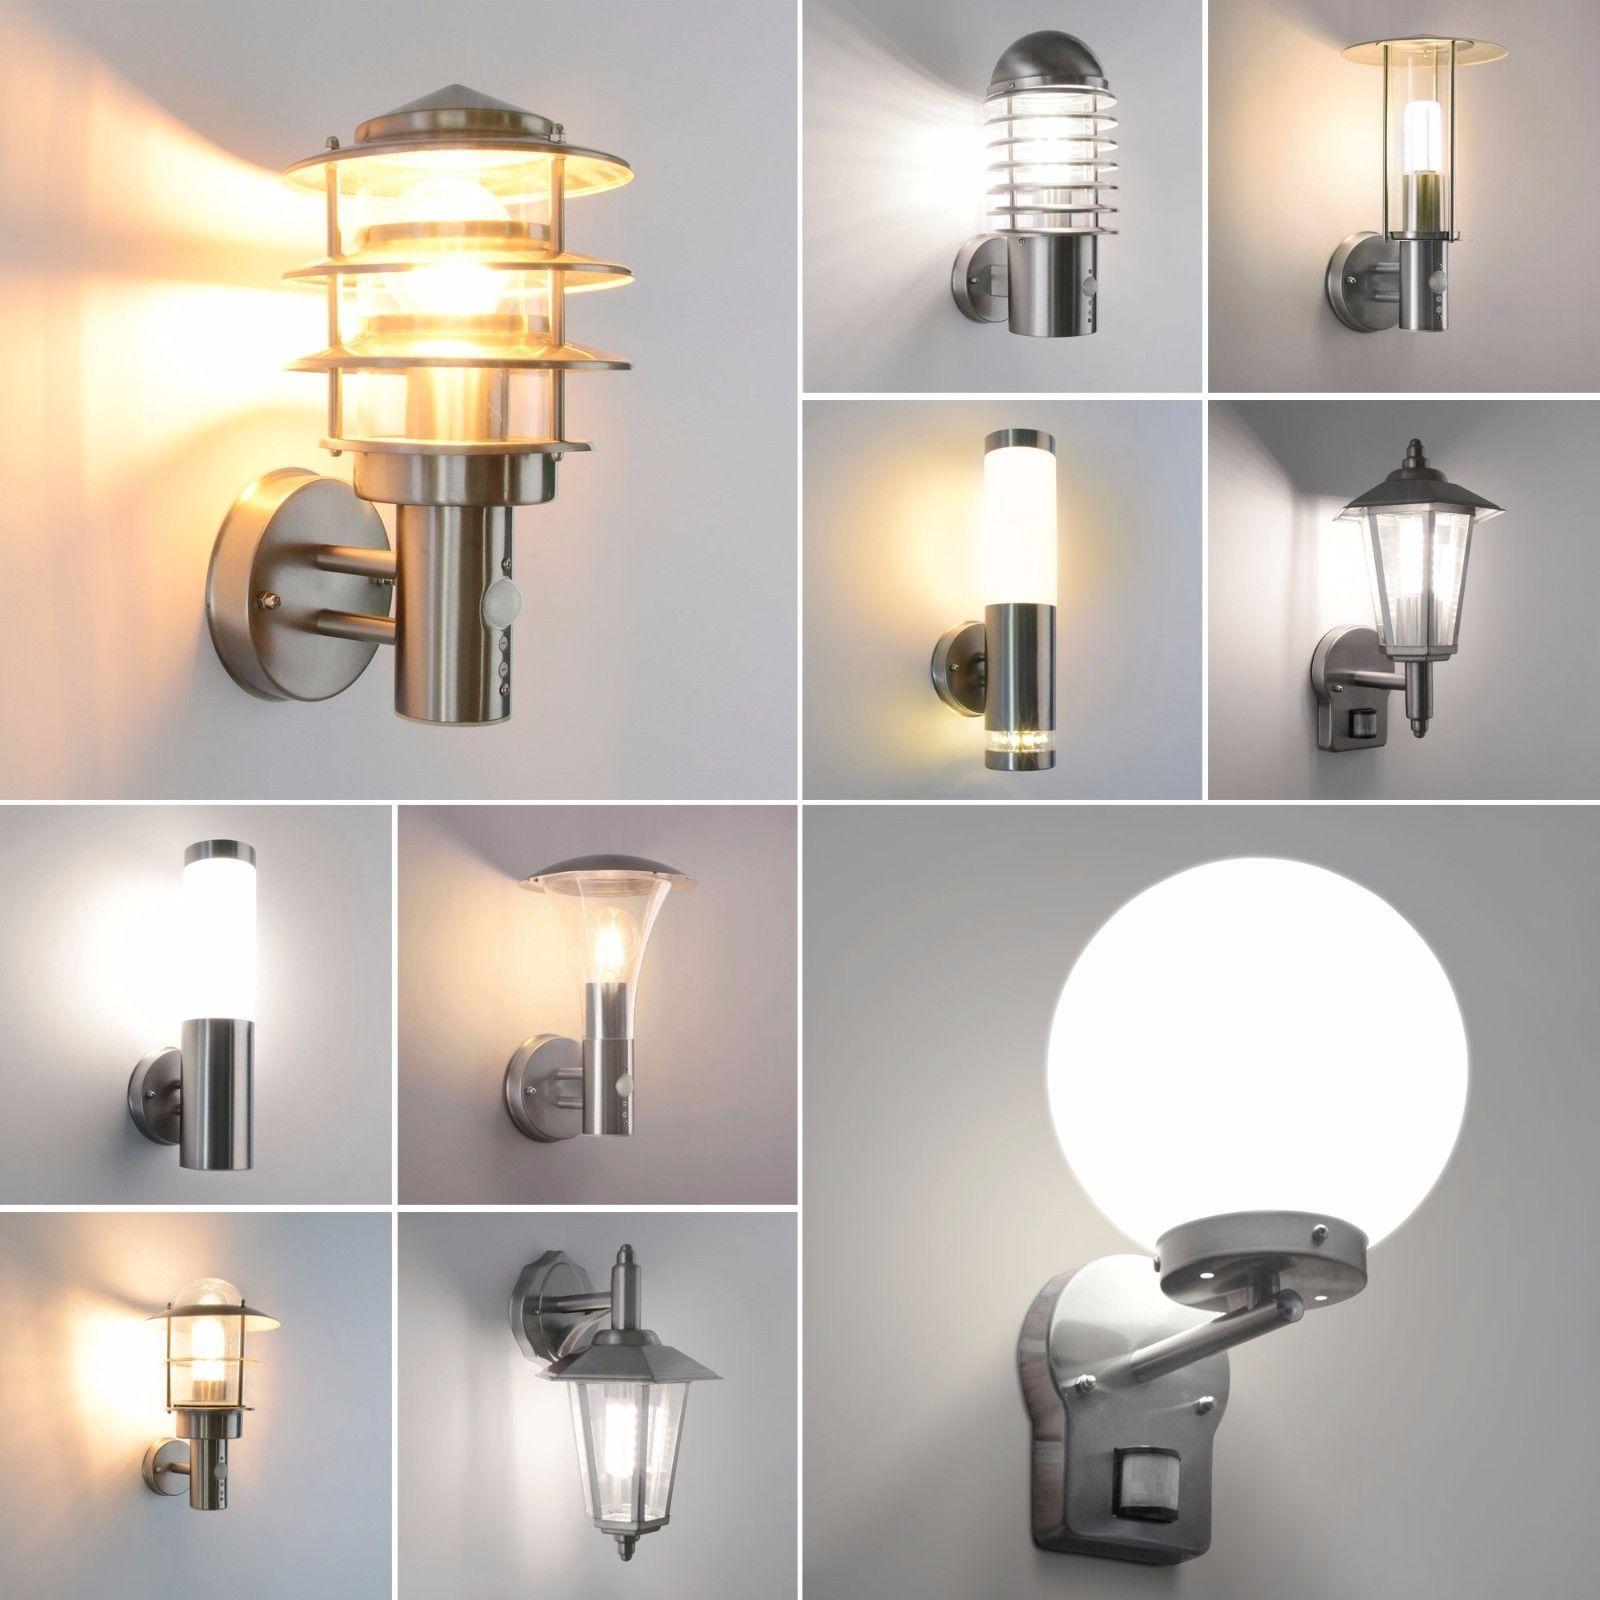 a85d1520cd923339ed830110e69f66c4 Schöne Led Lampen E27 60 Watt Dekorationen